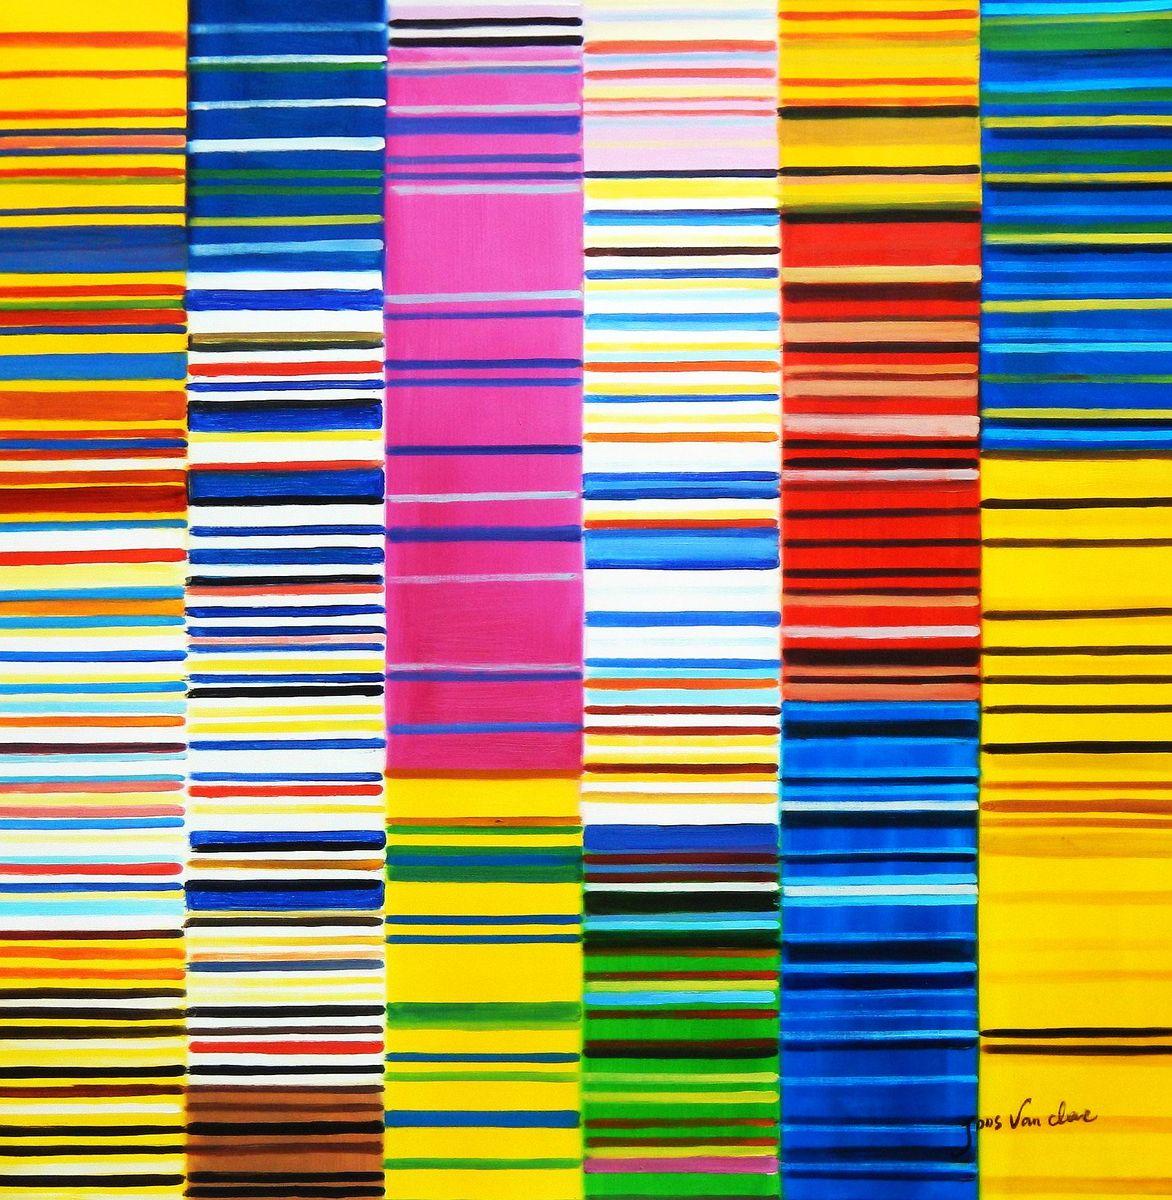 Modern Art - Lorenz stripes homage of Paul Smith g93102 80x80cm Ölgemälde